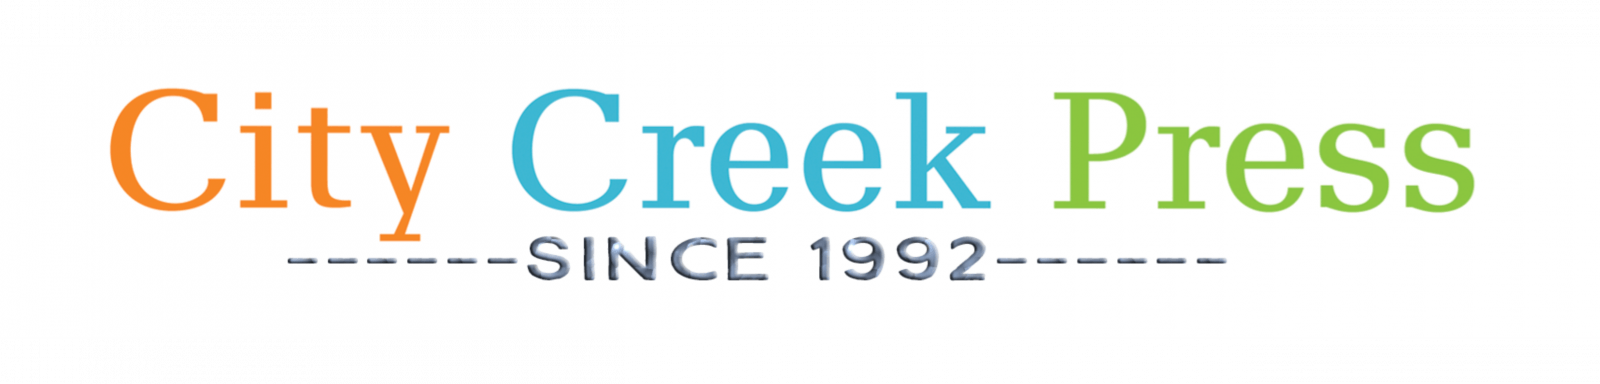 City Creek Press, Inc.